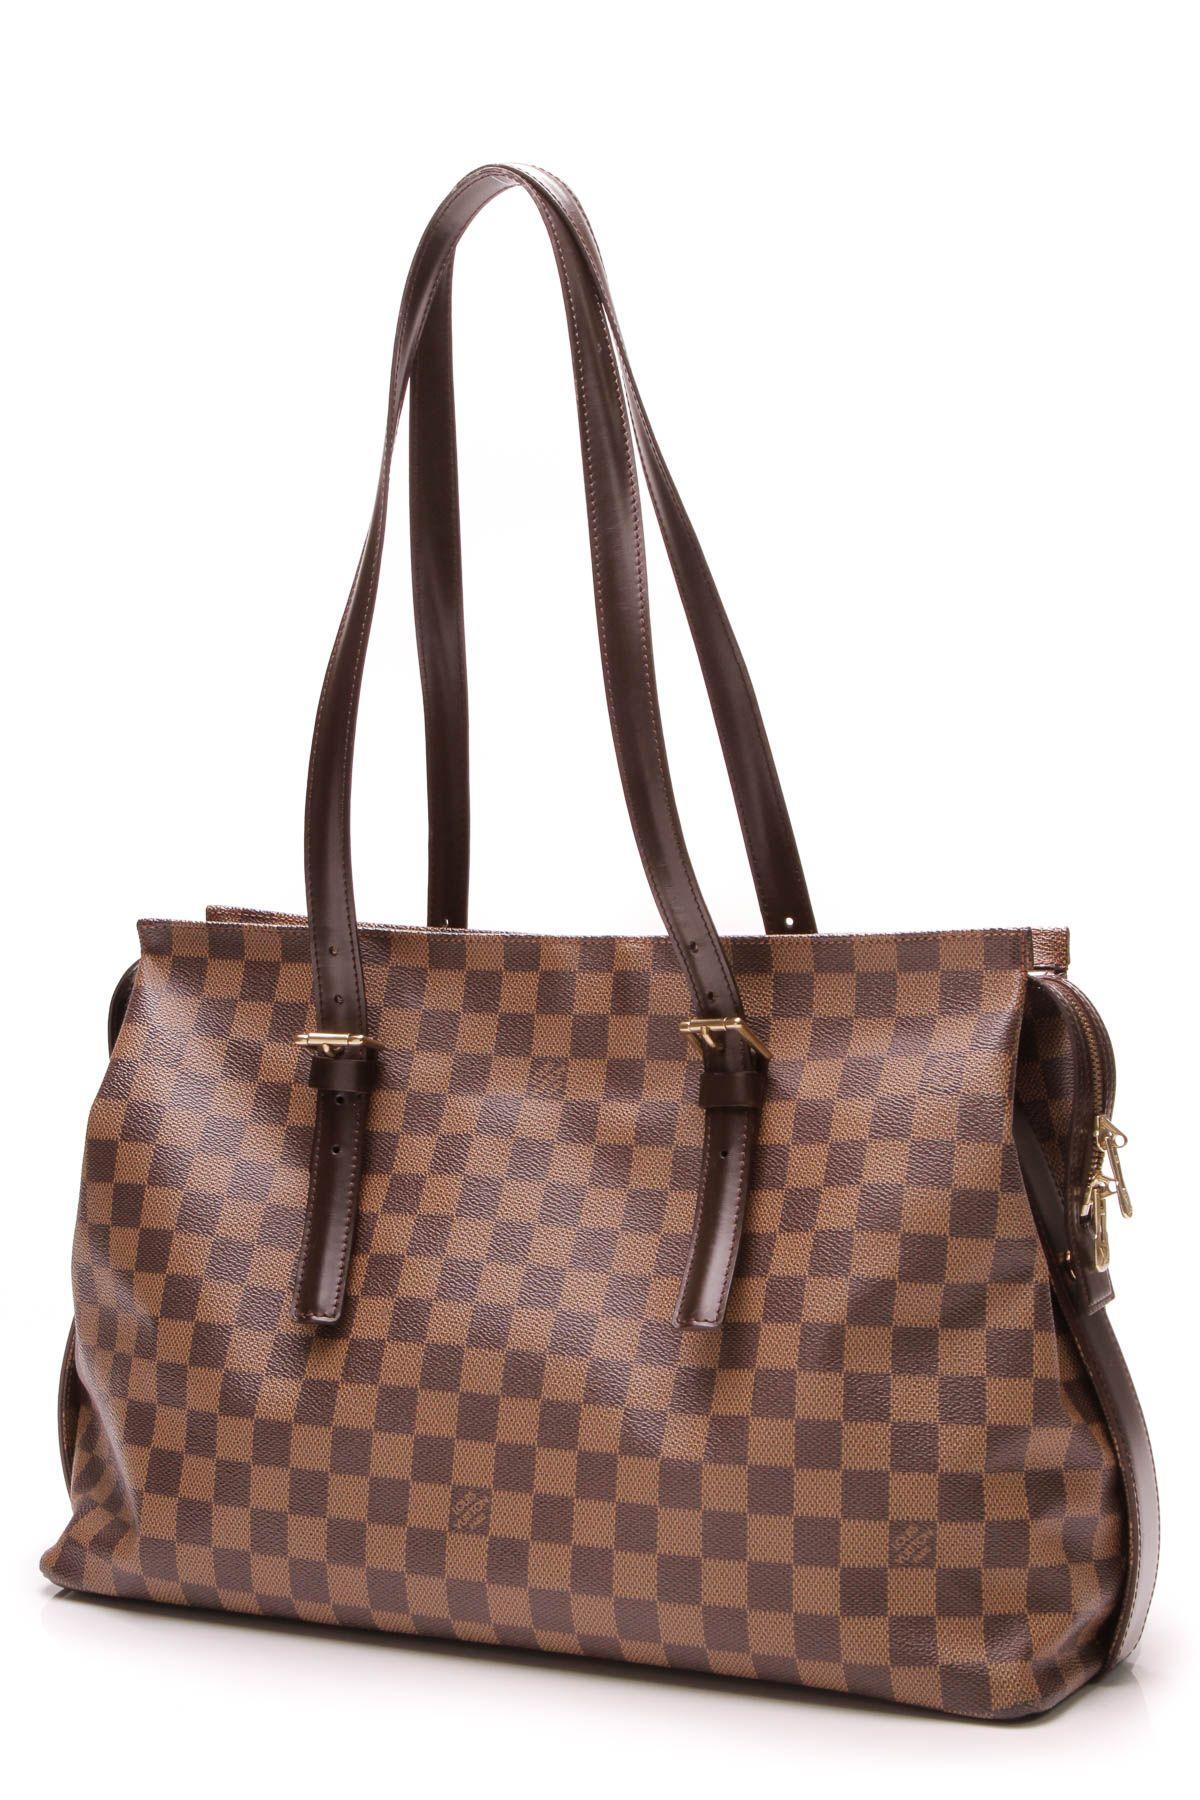 99ffc7815e9e8 Louis Vuitton Vintage Chelsea Tote Bag - Damier Ebene